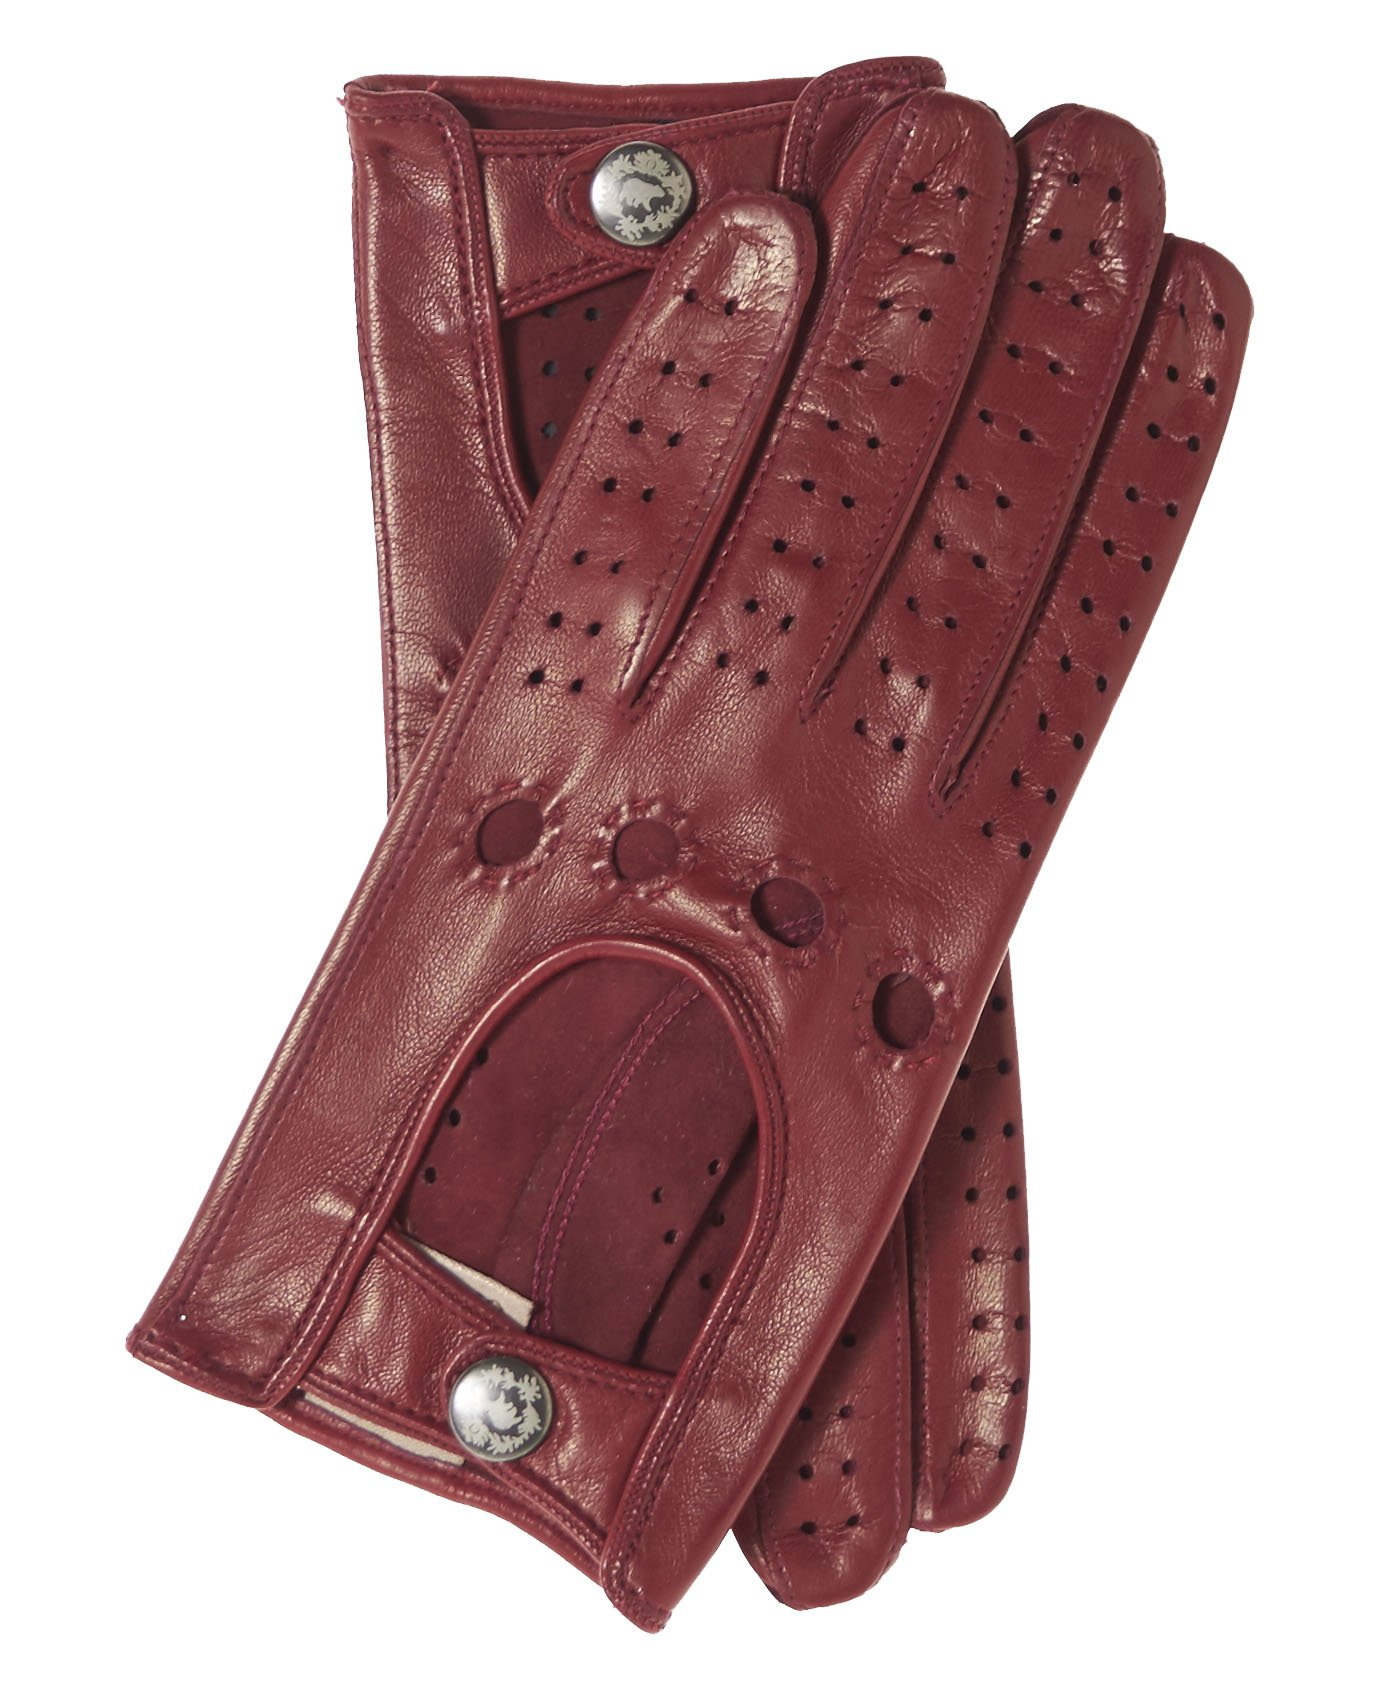 Fratelli Orsini Women's Italian Leather Driving Gloves Size 6 Color Oxblood